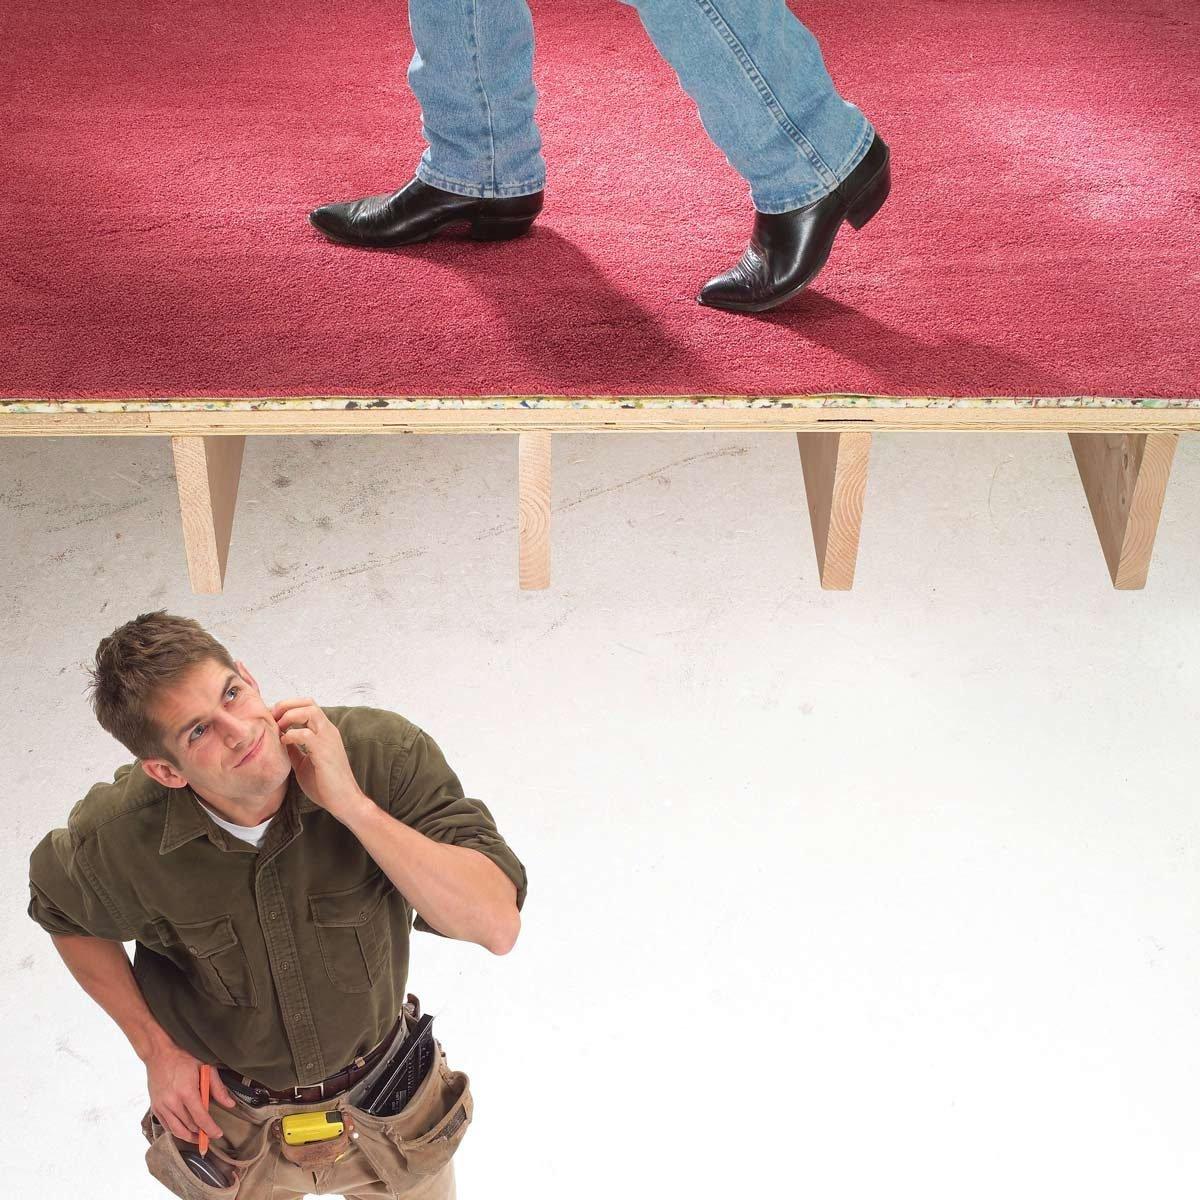 How To Fix Squeaky Floors Family Handyman